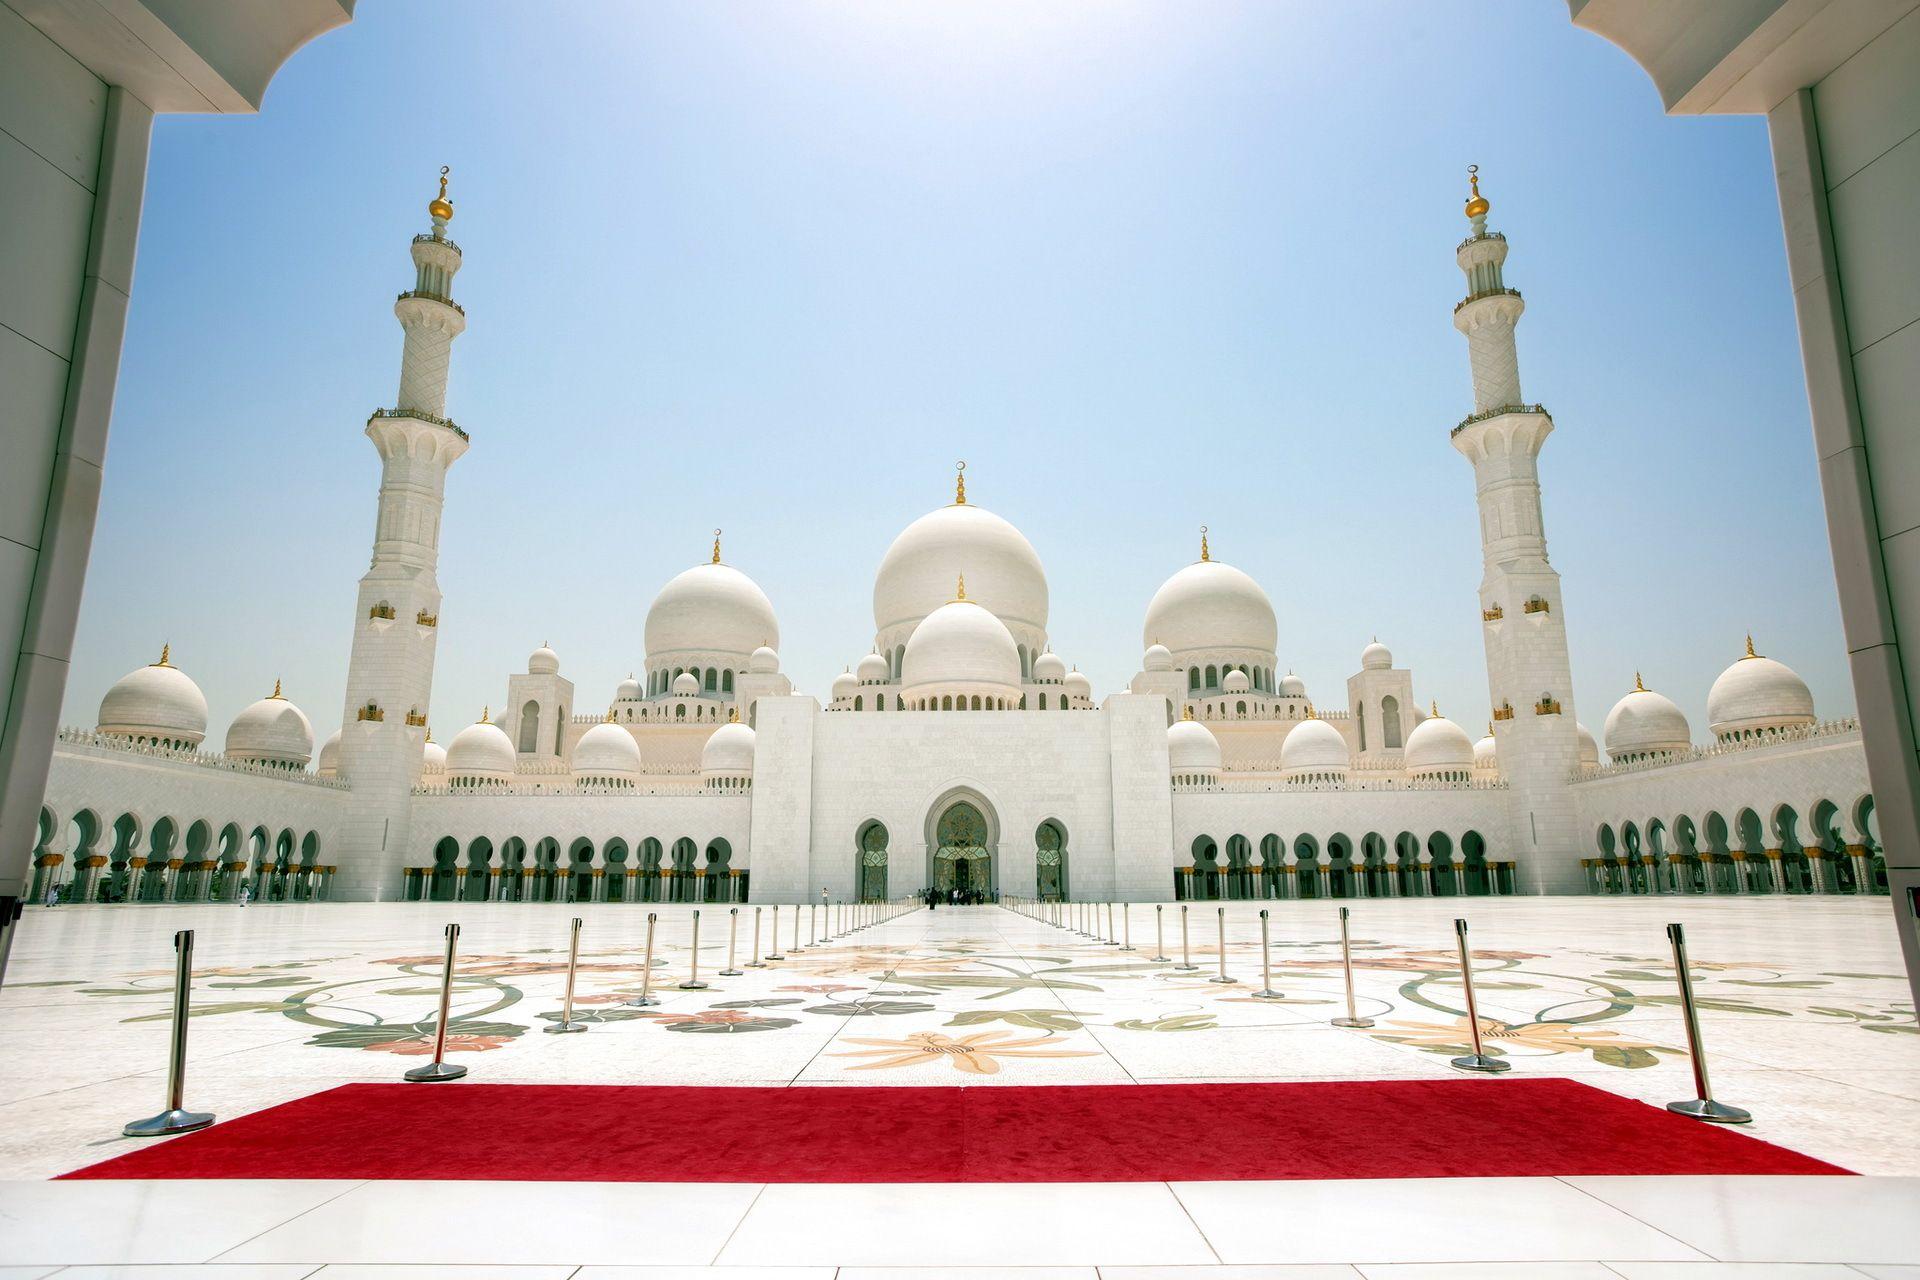 Abu Dhabi City Day Wallpaper GB HD Wallpapers